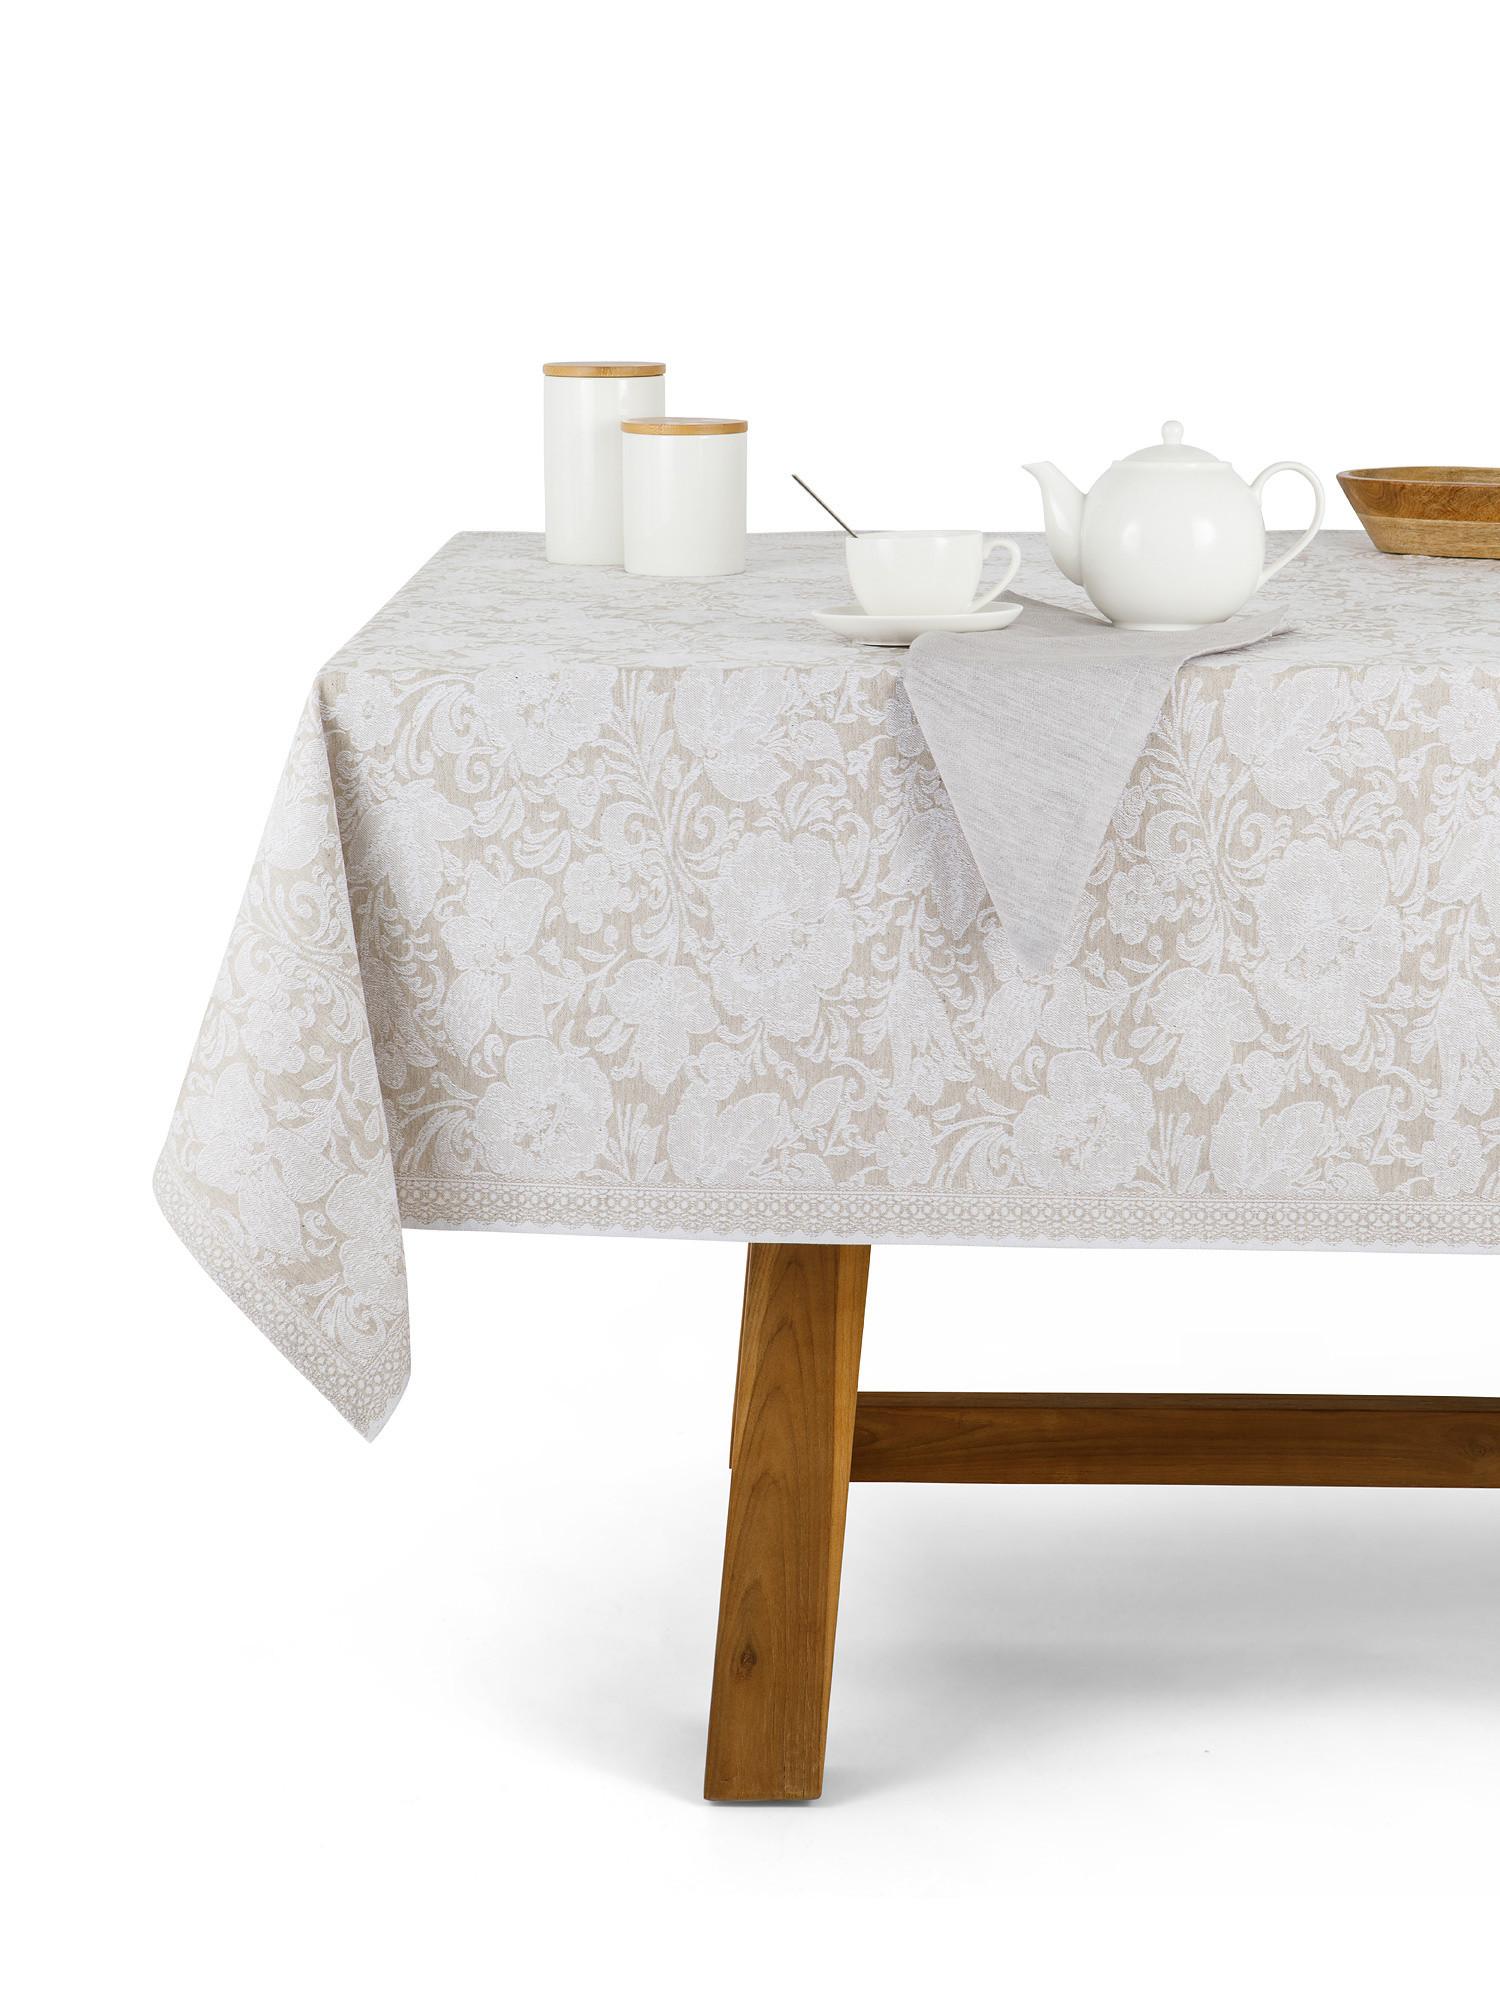 Tovaglia centrotavola lino e cotone motivo ornamentale, Bianco, large image number 0